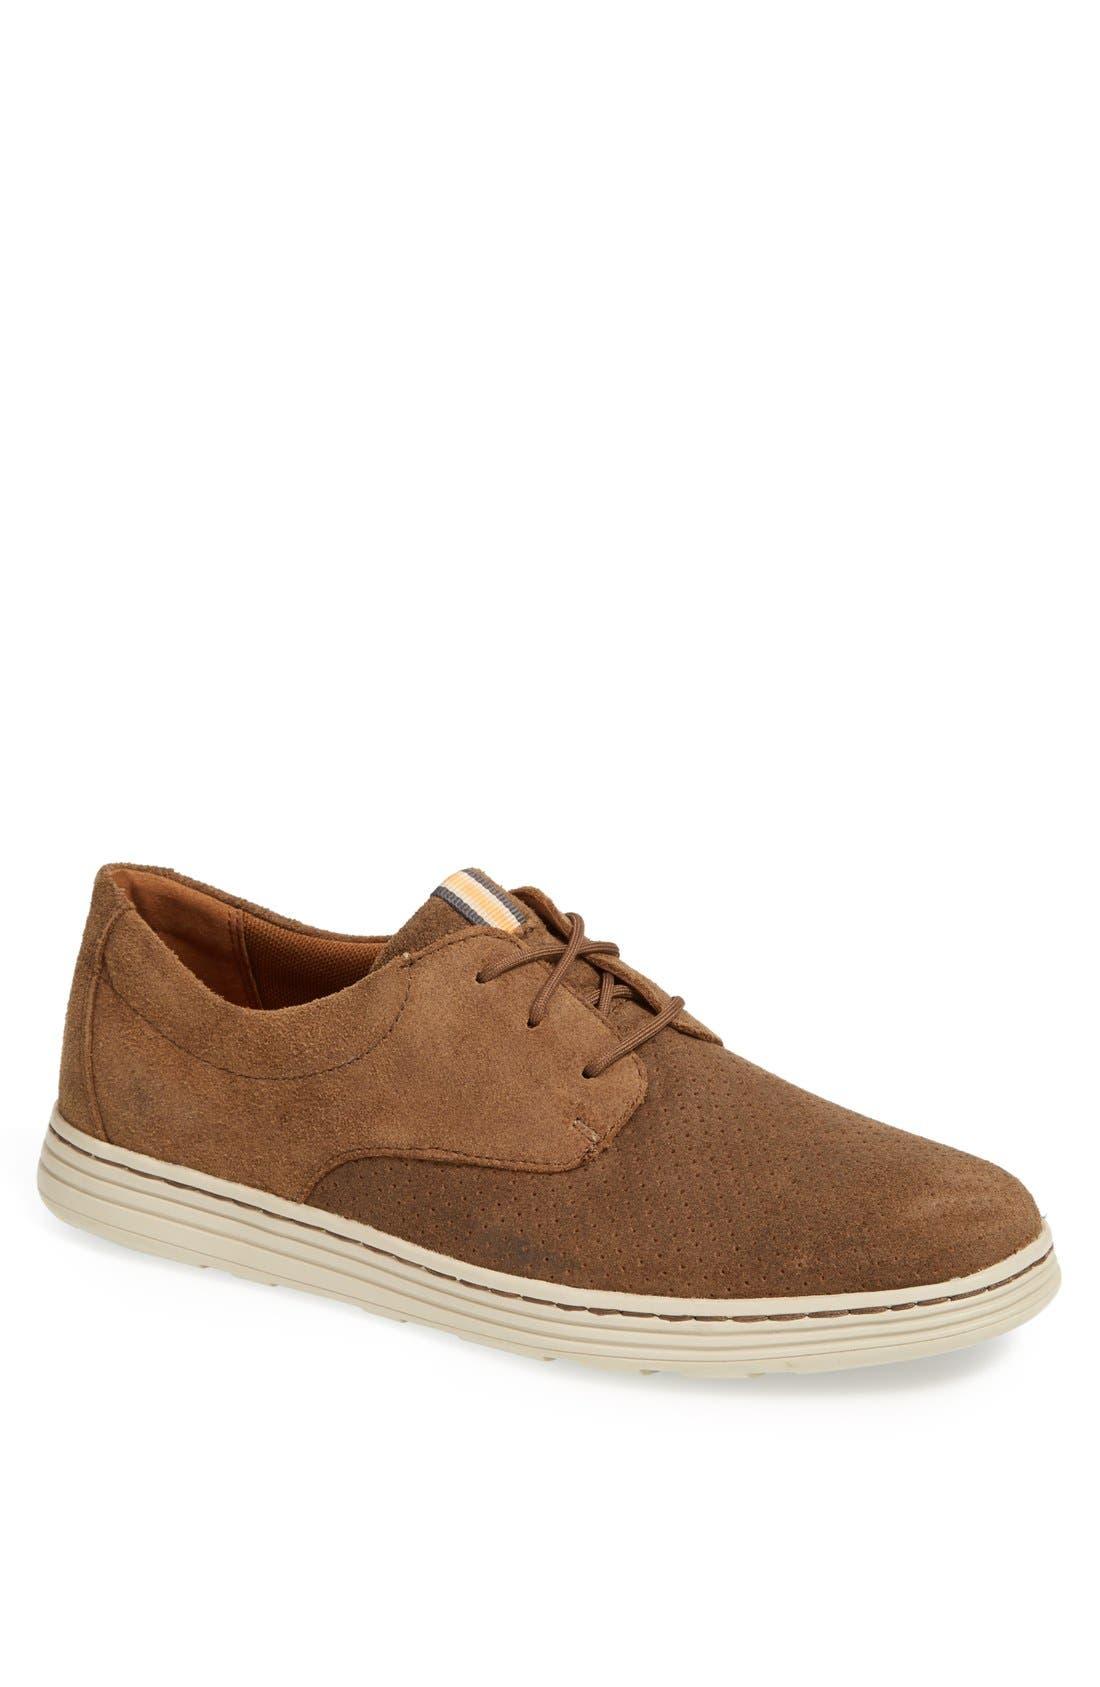 Alternate Image 1 Selected - Dunham 'Camden' Sneaker